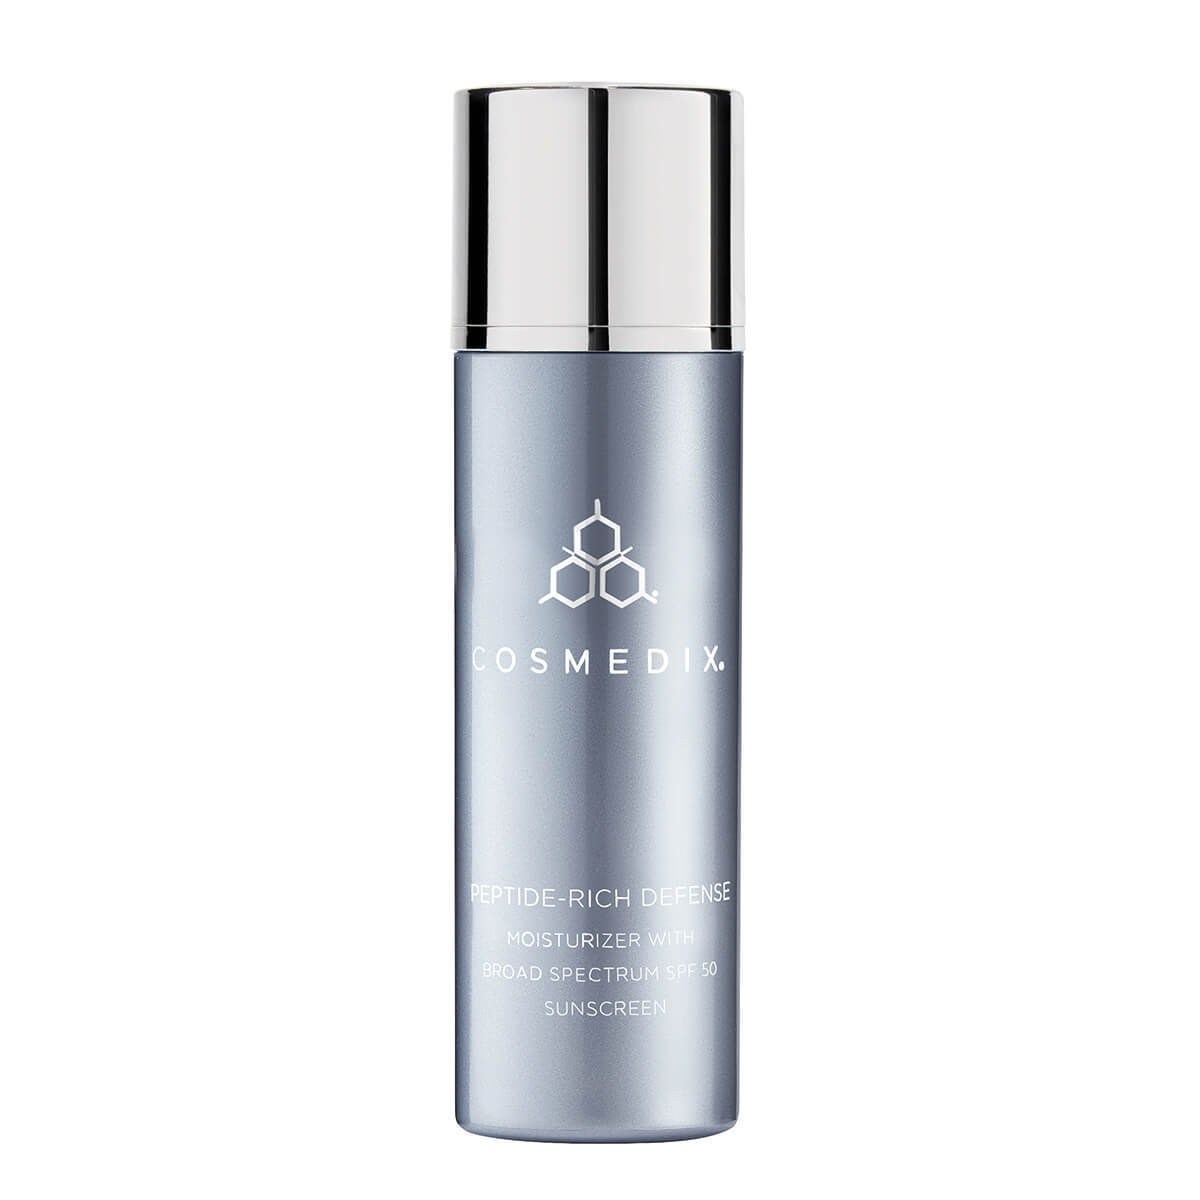 Крем солнцезащитный Cosmedix Peptide-Rich Defense SPF50 Sunscreen 50 мл